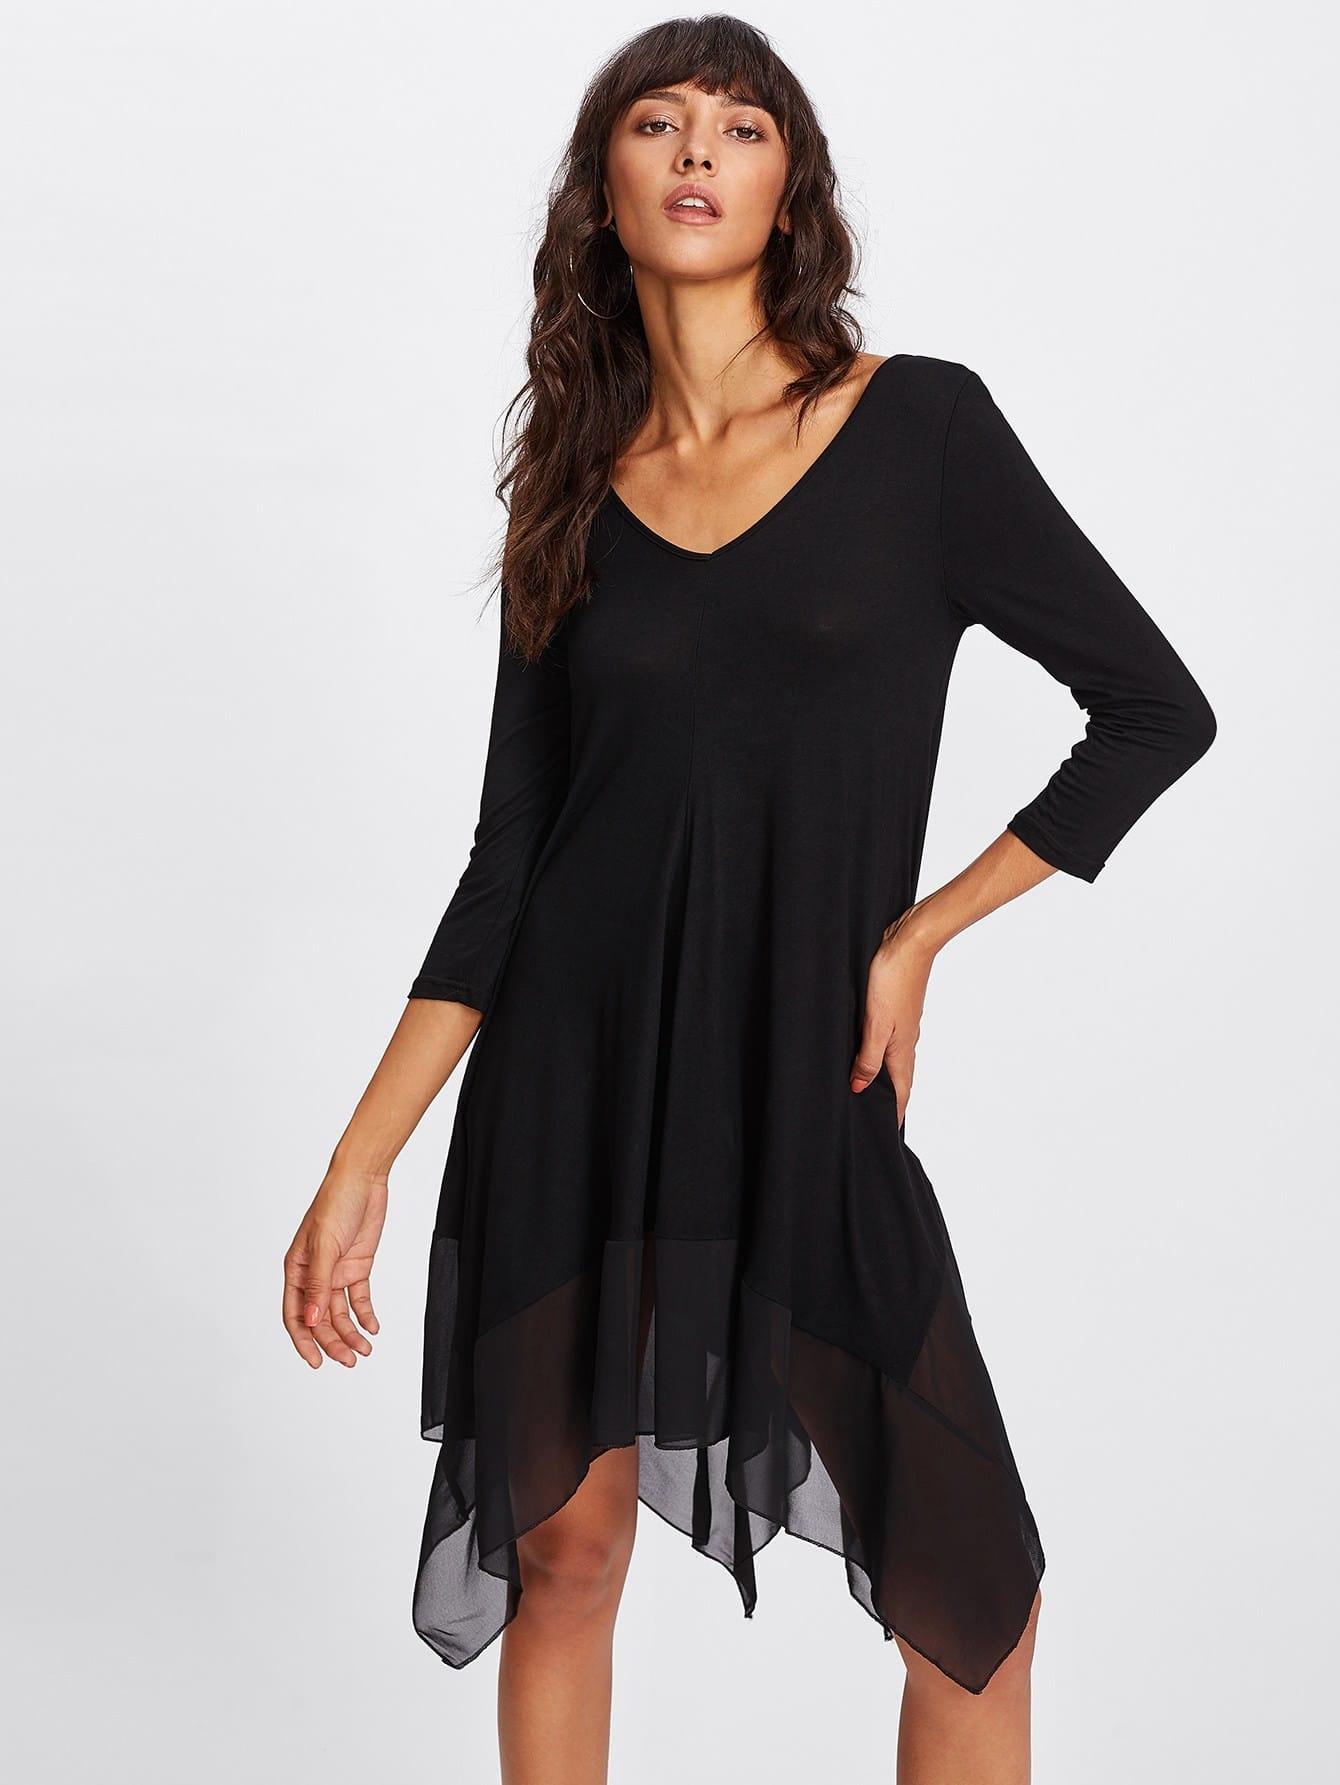 Contrast Mesh Hanky Hem Dress high slit hanky hem metallic halter dress